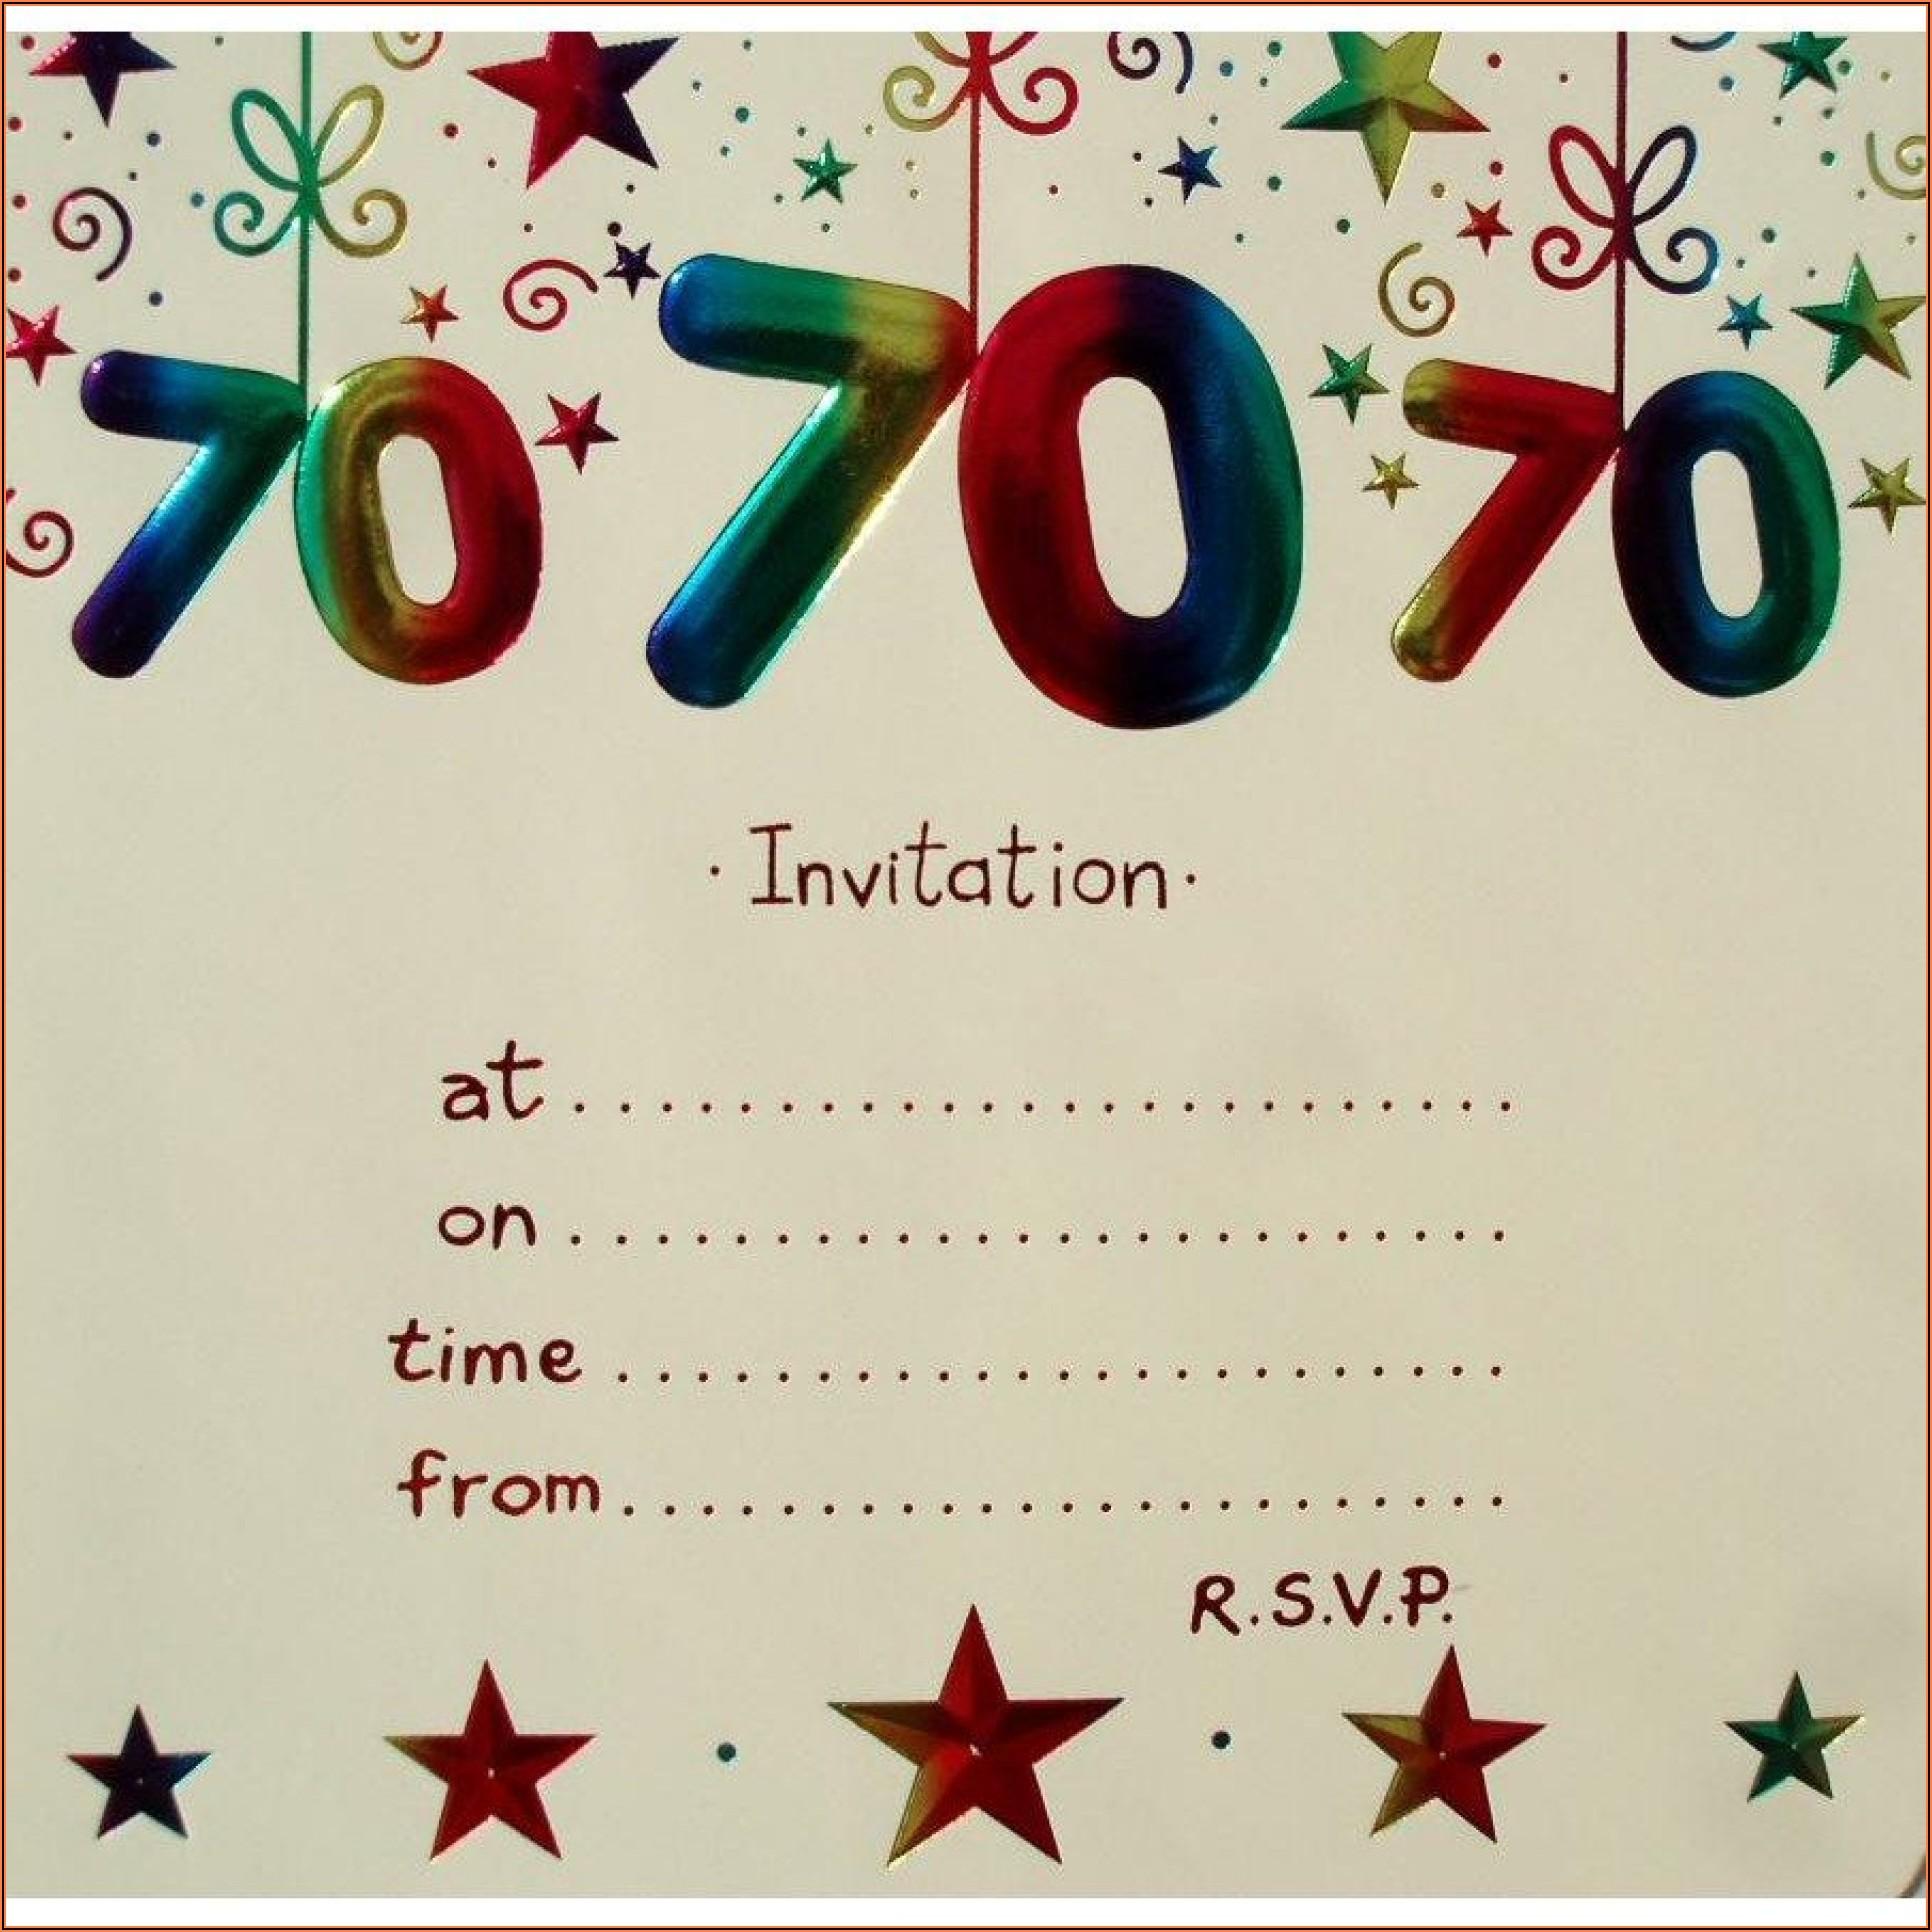 70th Birthday Invitations With Photos Free